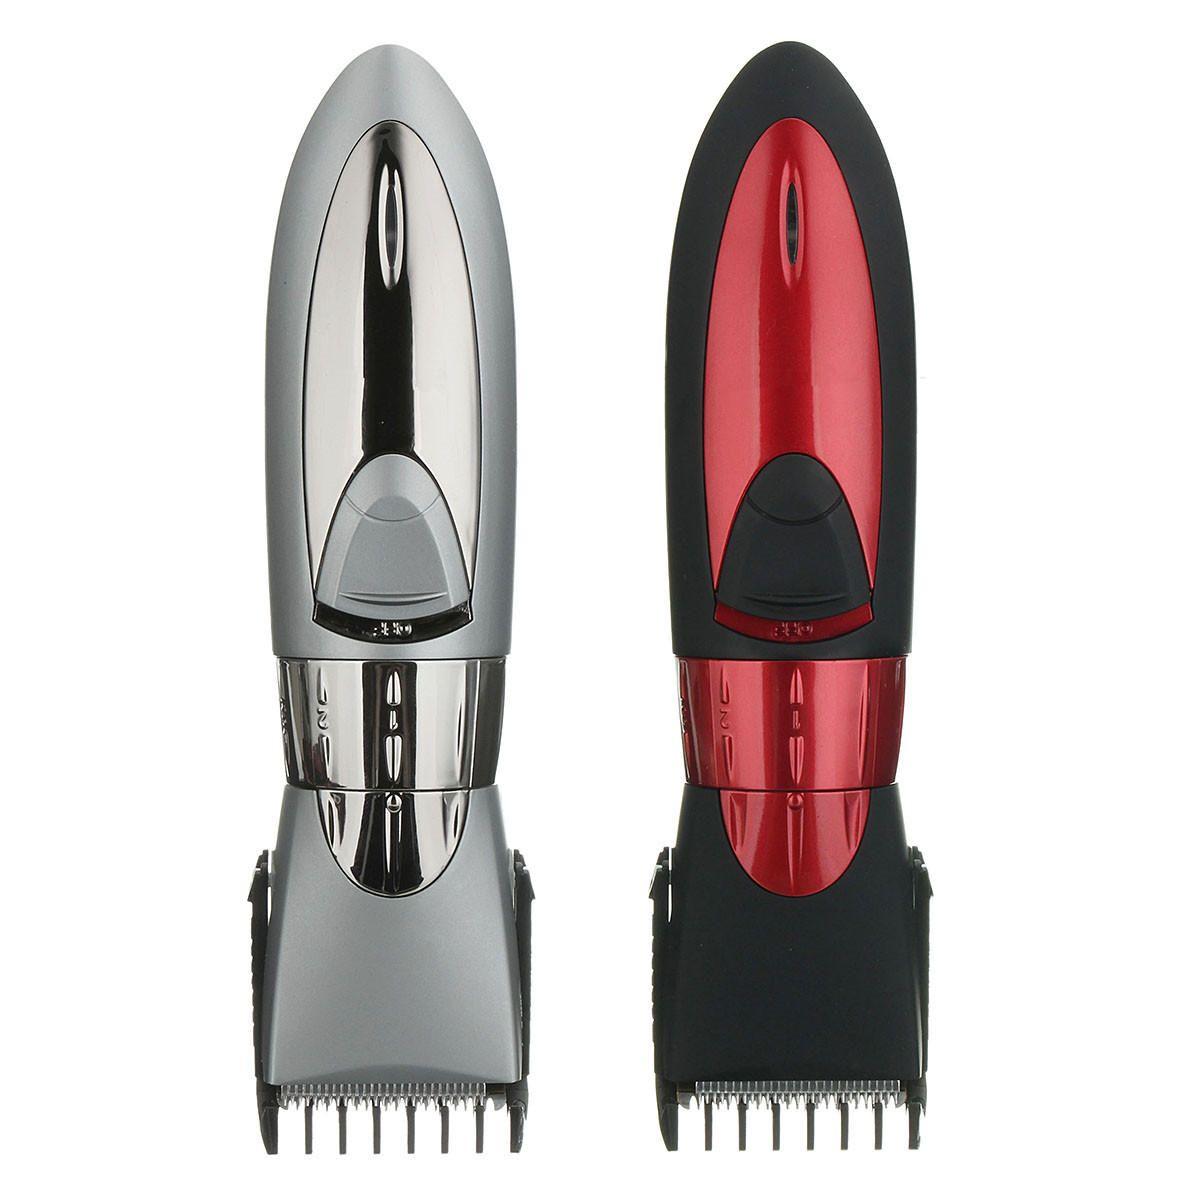 Waterproof Electric Hair Clipper Trimmer Mens Shaver Razor Beard Cutting Machine